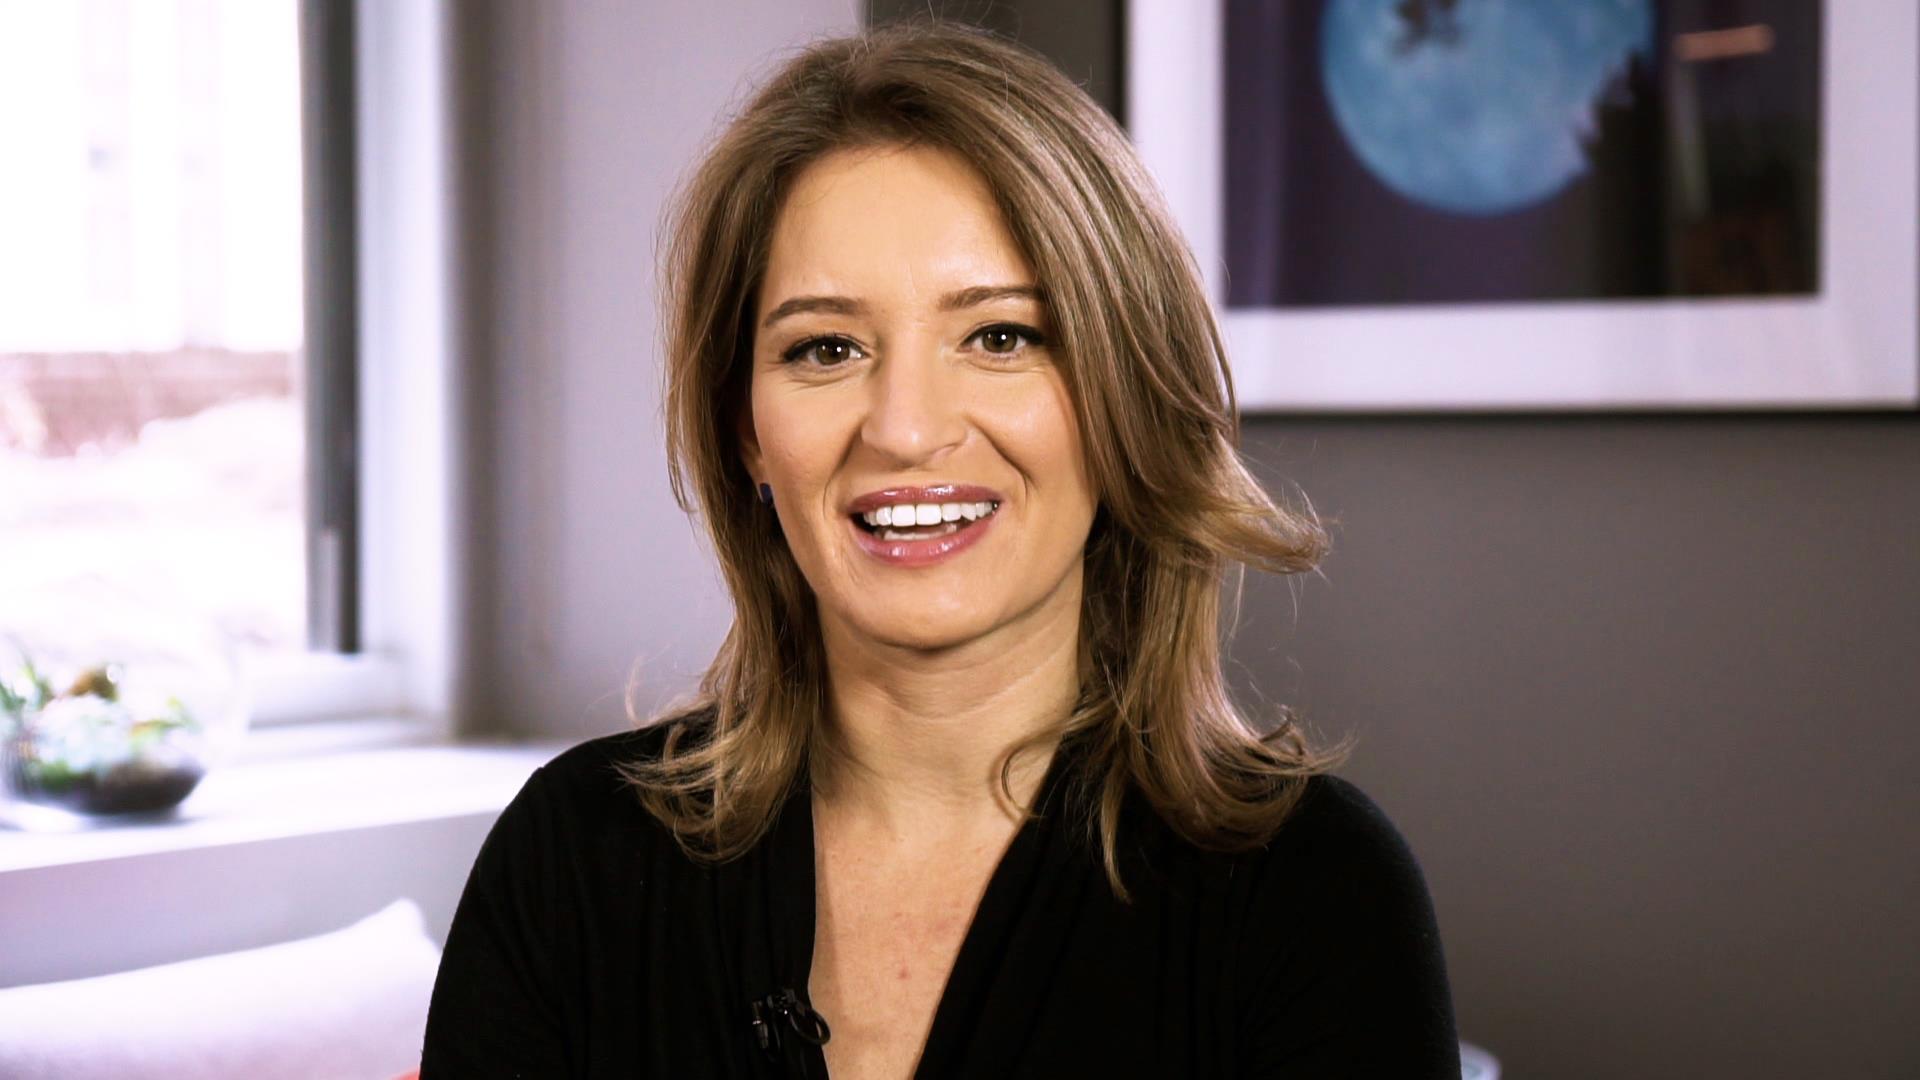 Womentum lets anyone donate to female entrepreneurs around the world